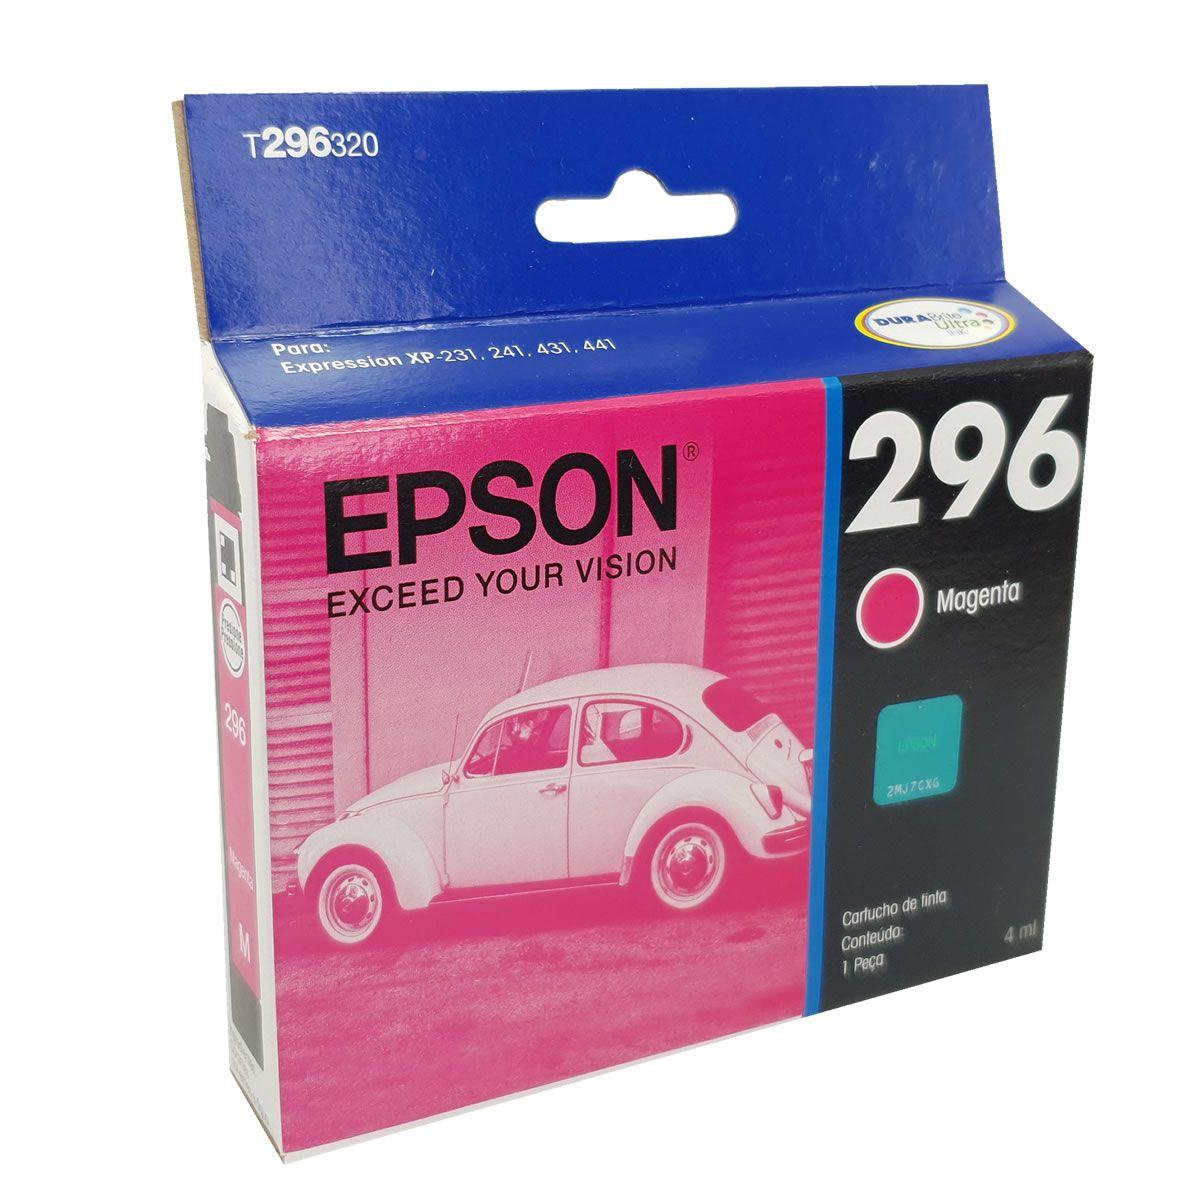 Tinta p/ cartucho da impressora Epson XP 241 magenta